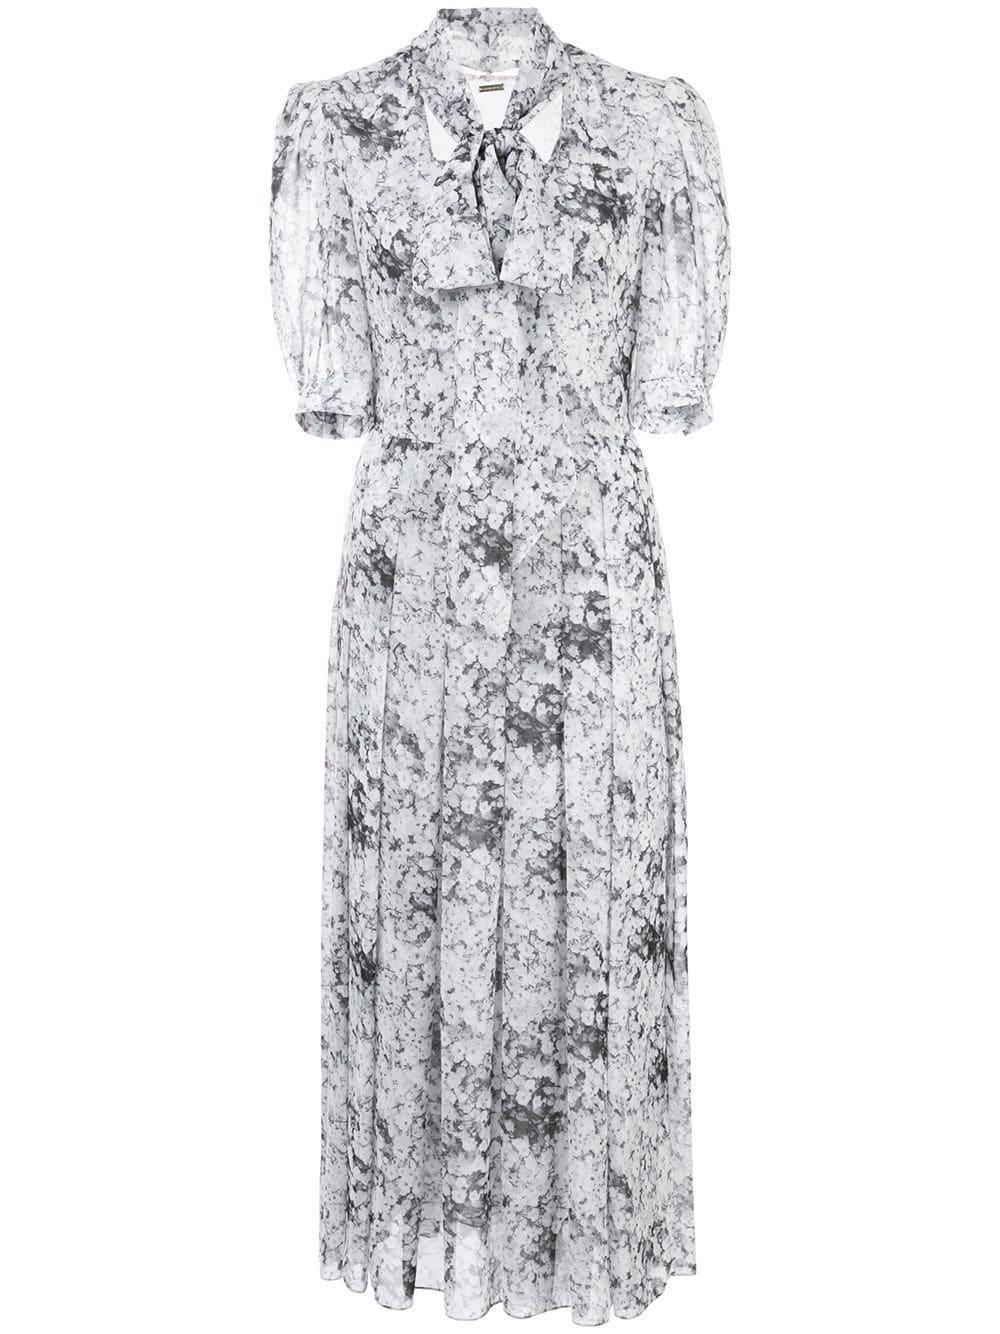 Elbow Sleeve Baby's Breath Print Dress